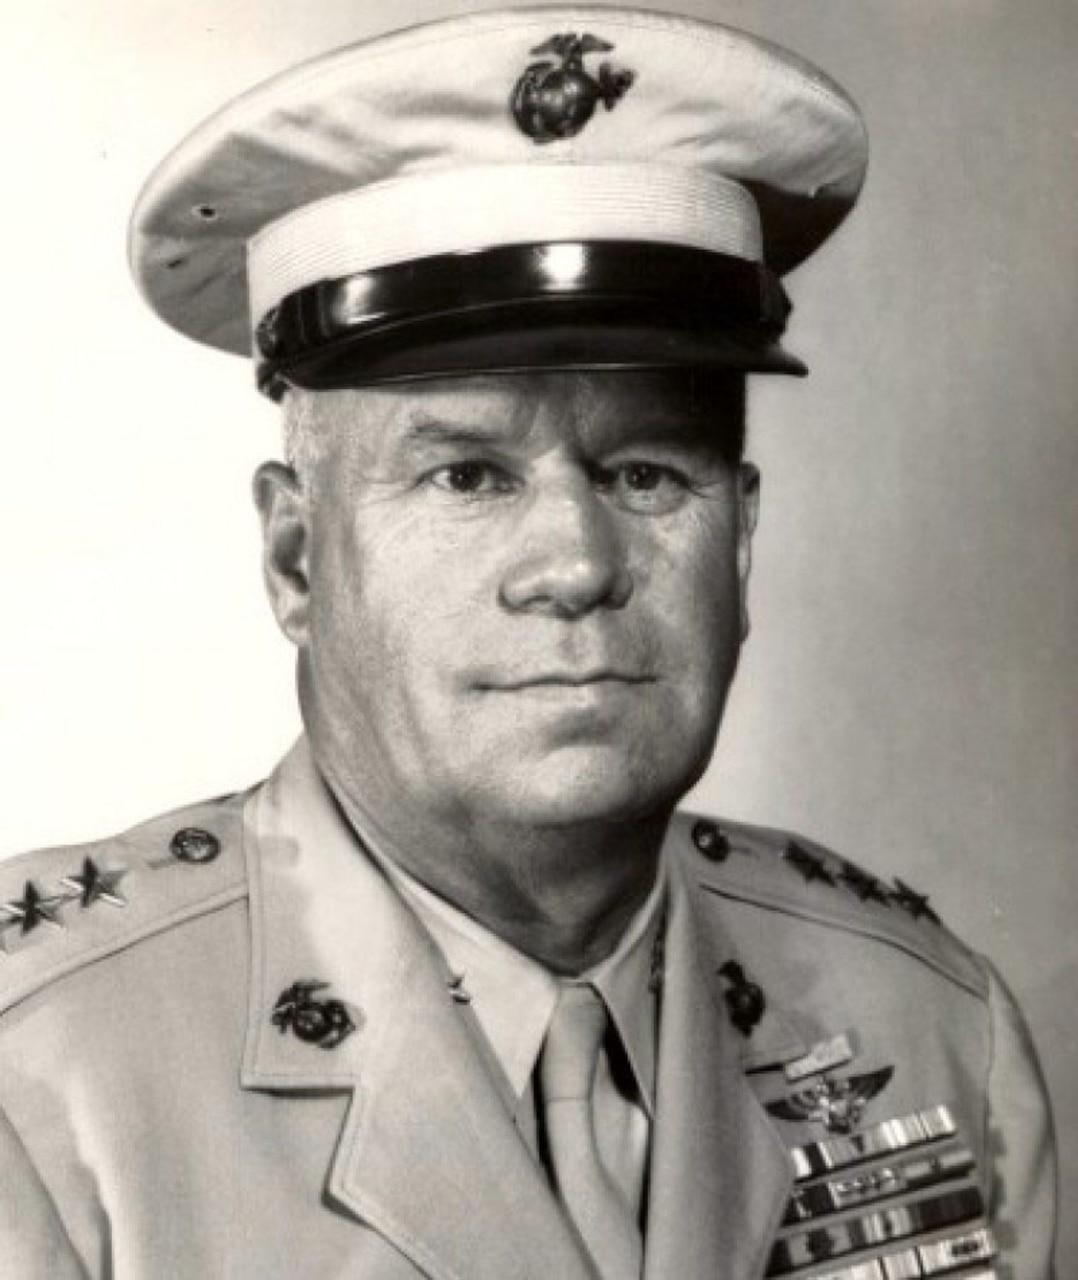 A man in uniform looks toward a camera.